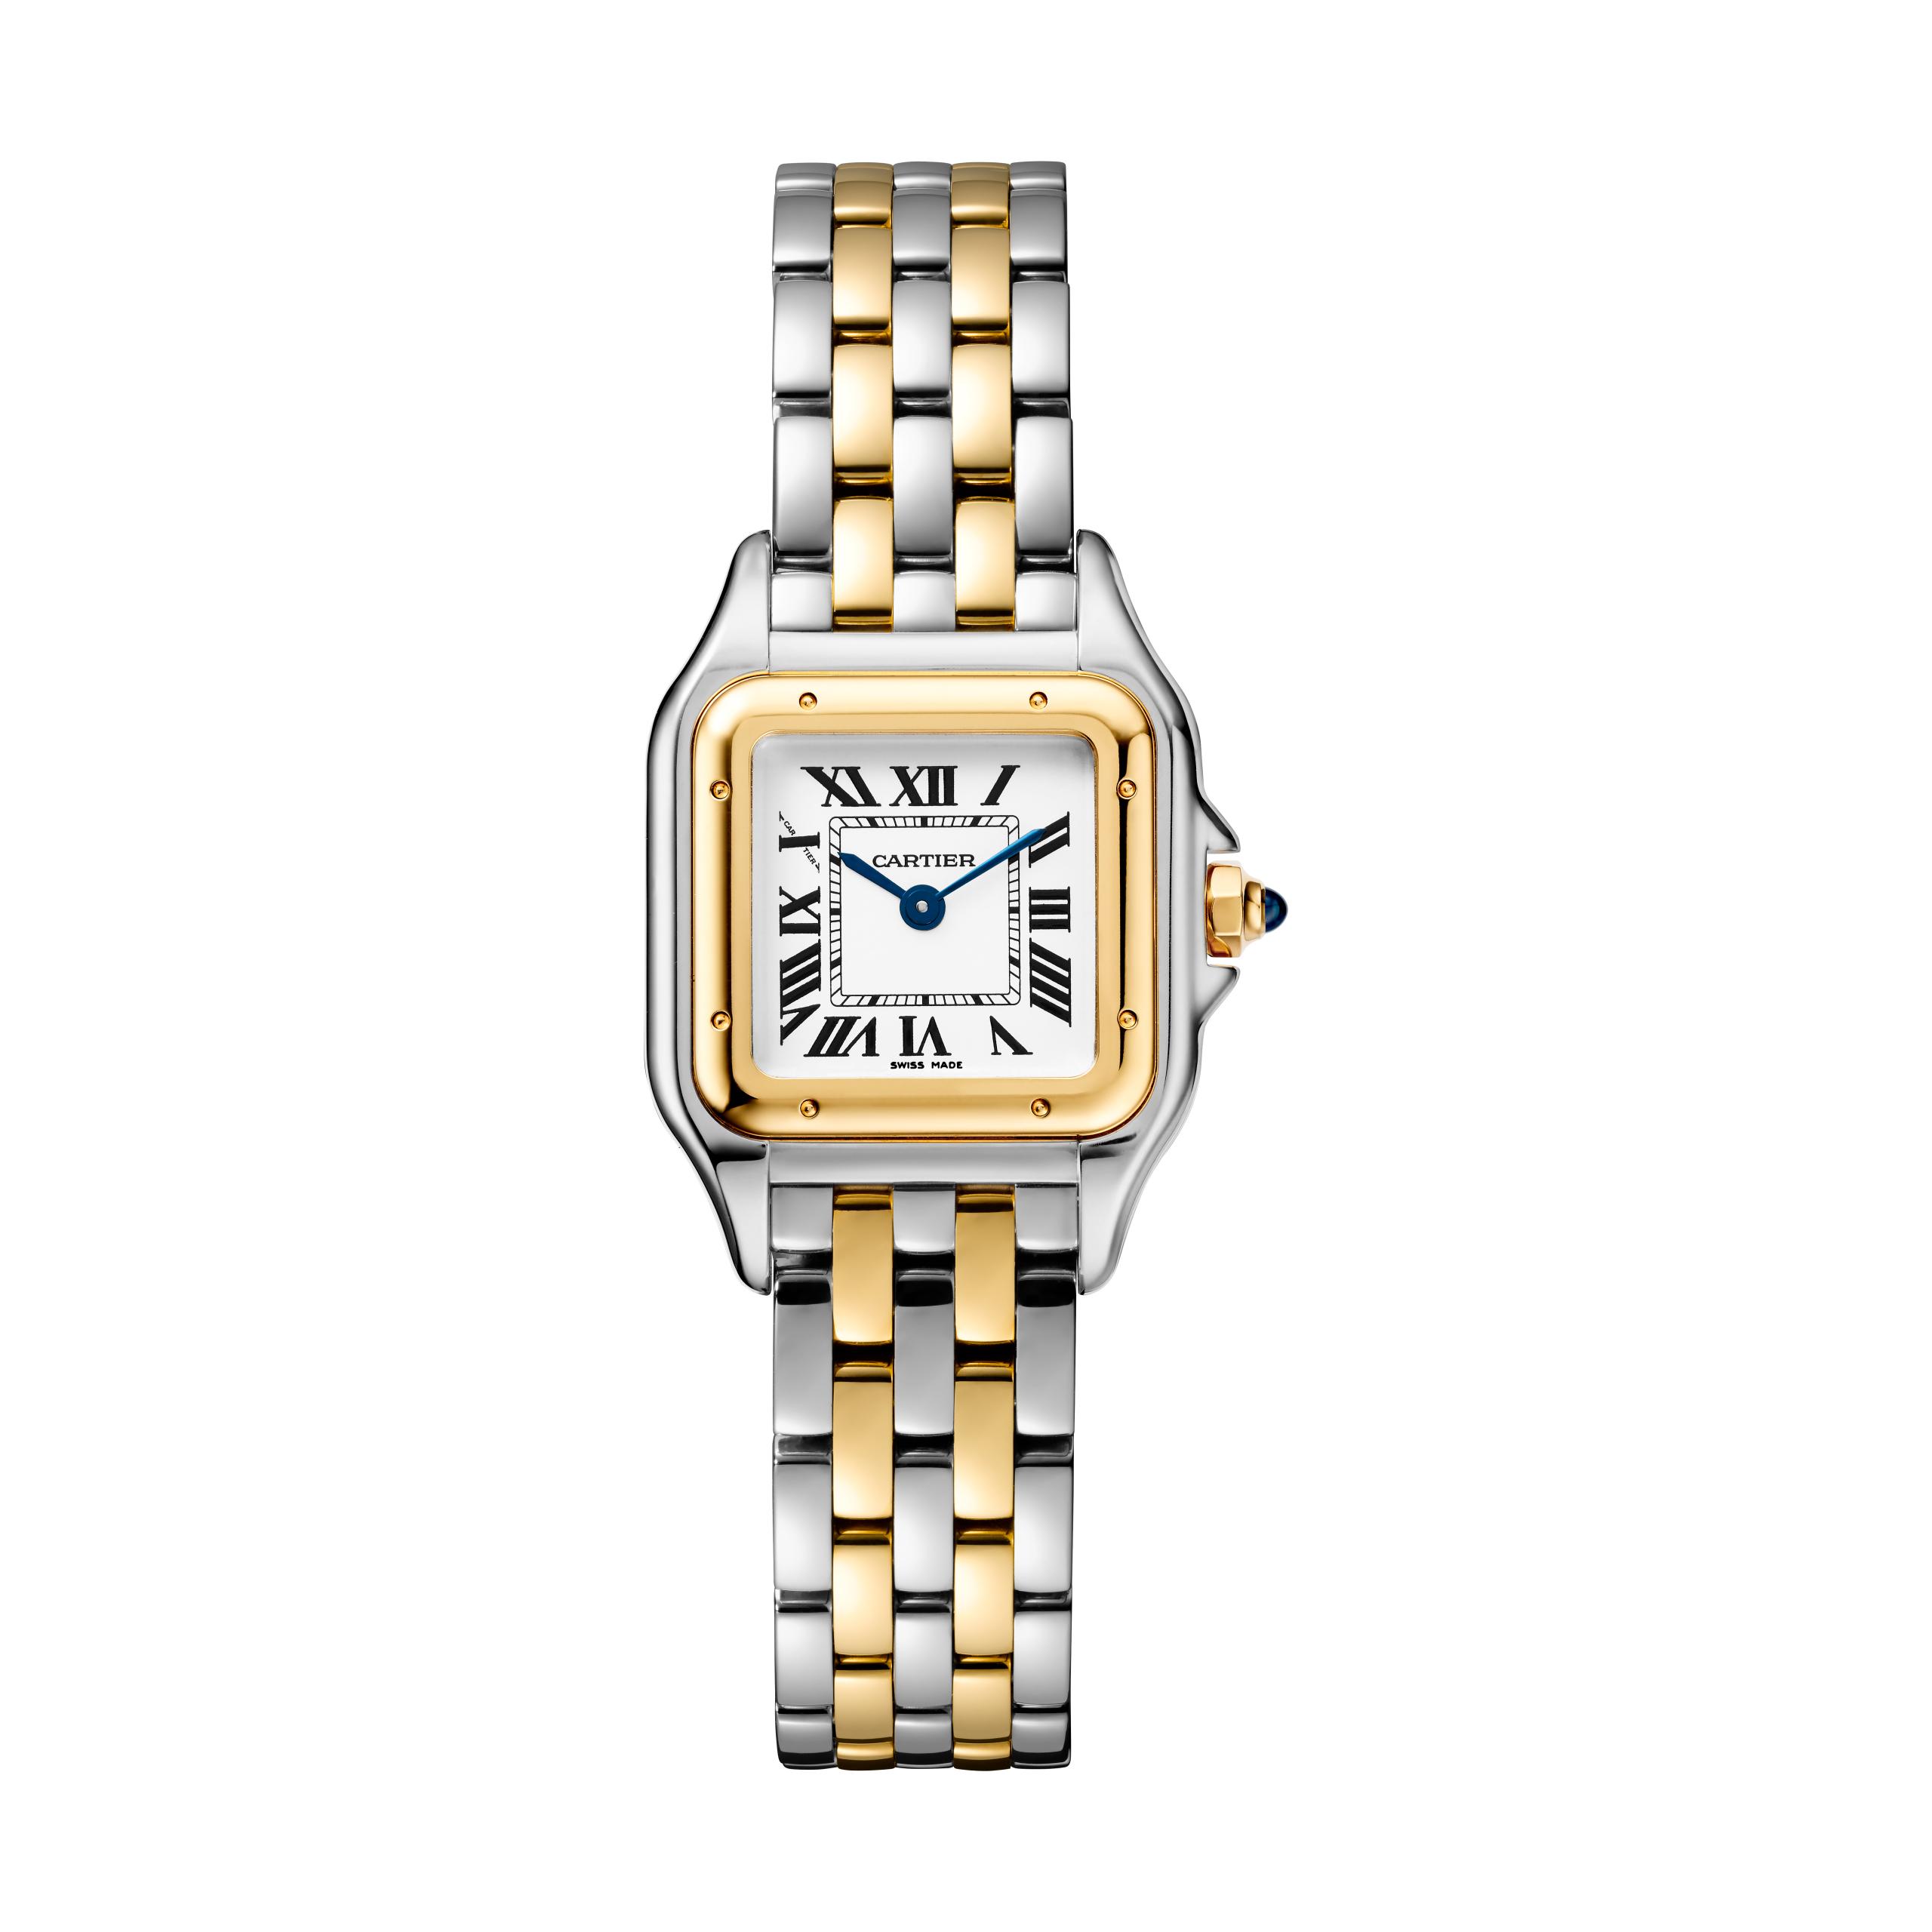 Reloj Panthère Cartier oro blanco y oro amarillo tamaño mediano